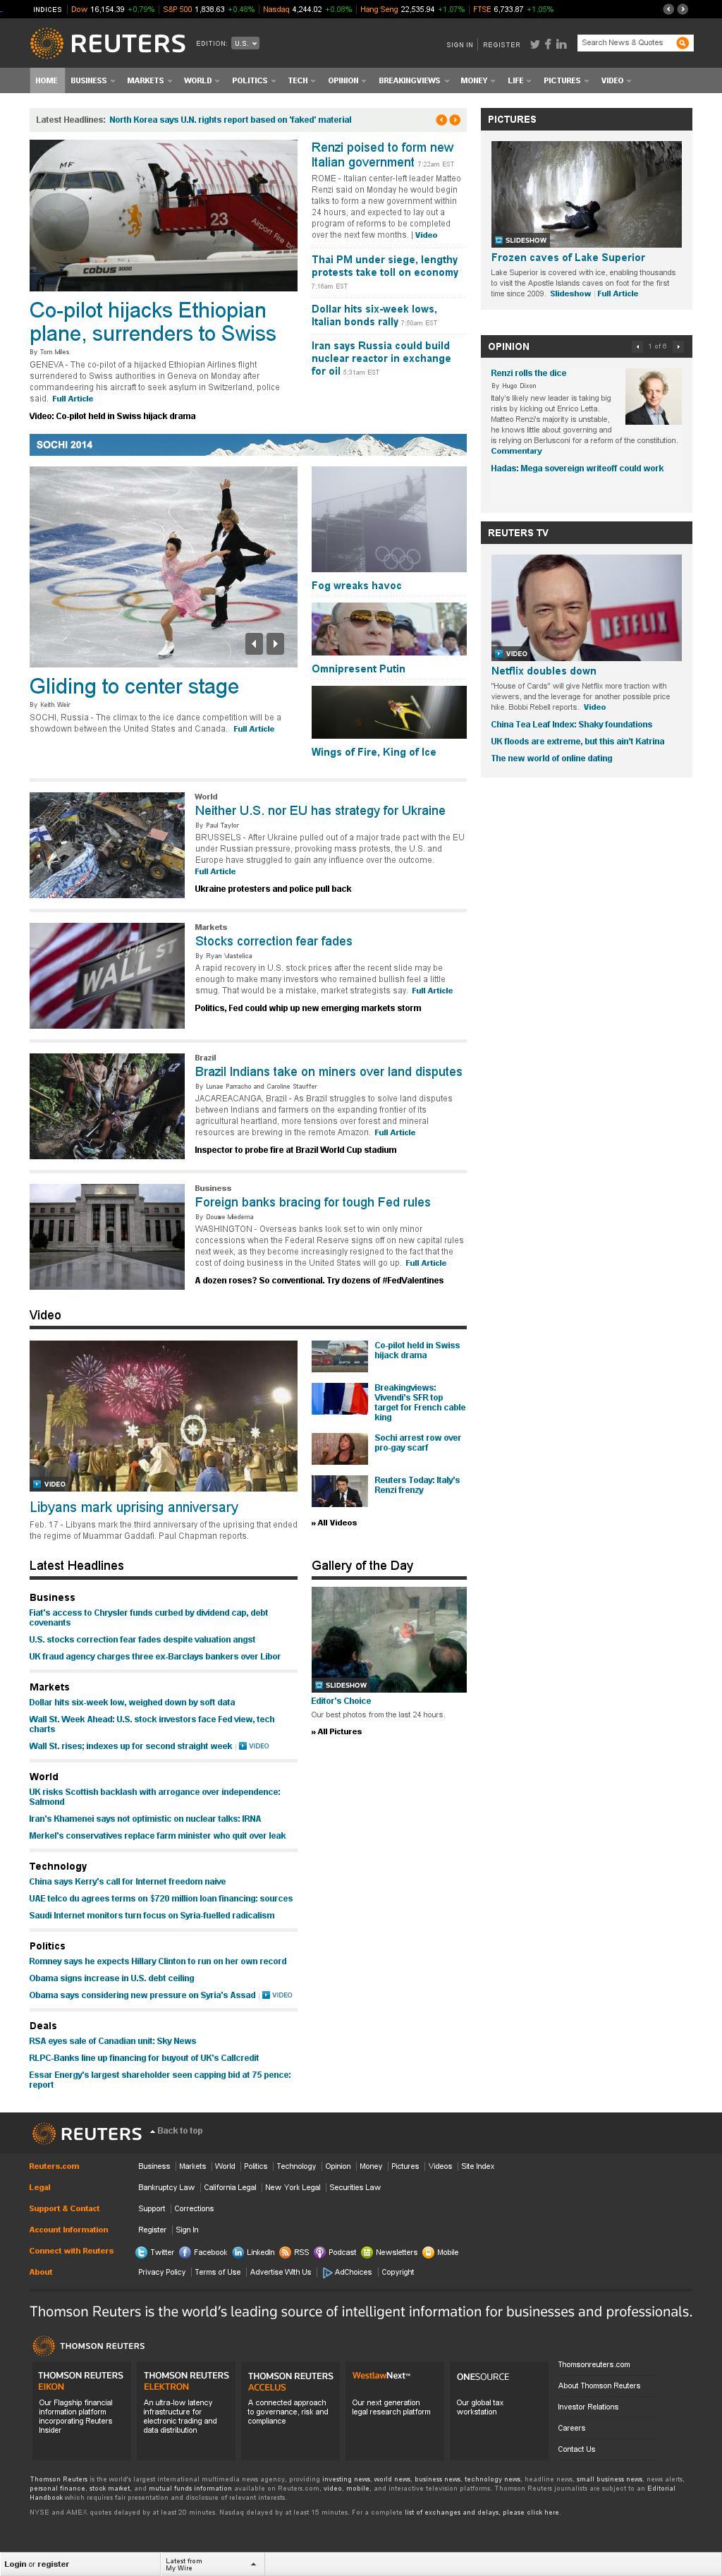 Reuters at Monday Feb. 17, 2014, 1:14 p.m. UTC